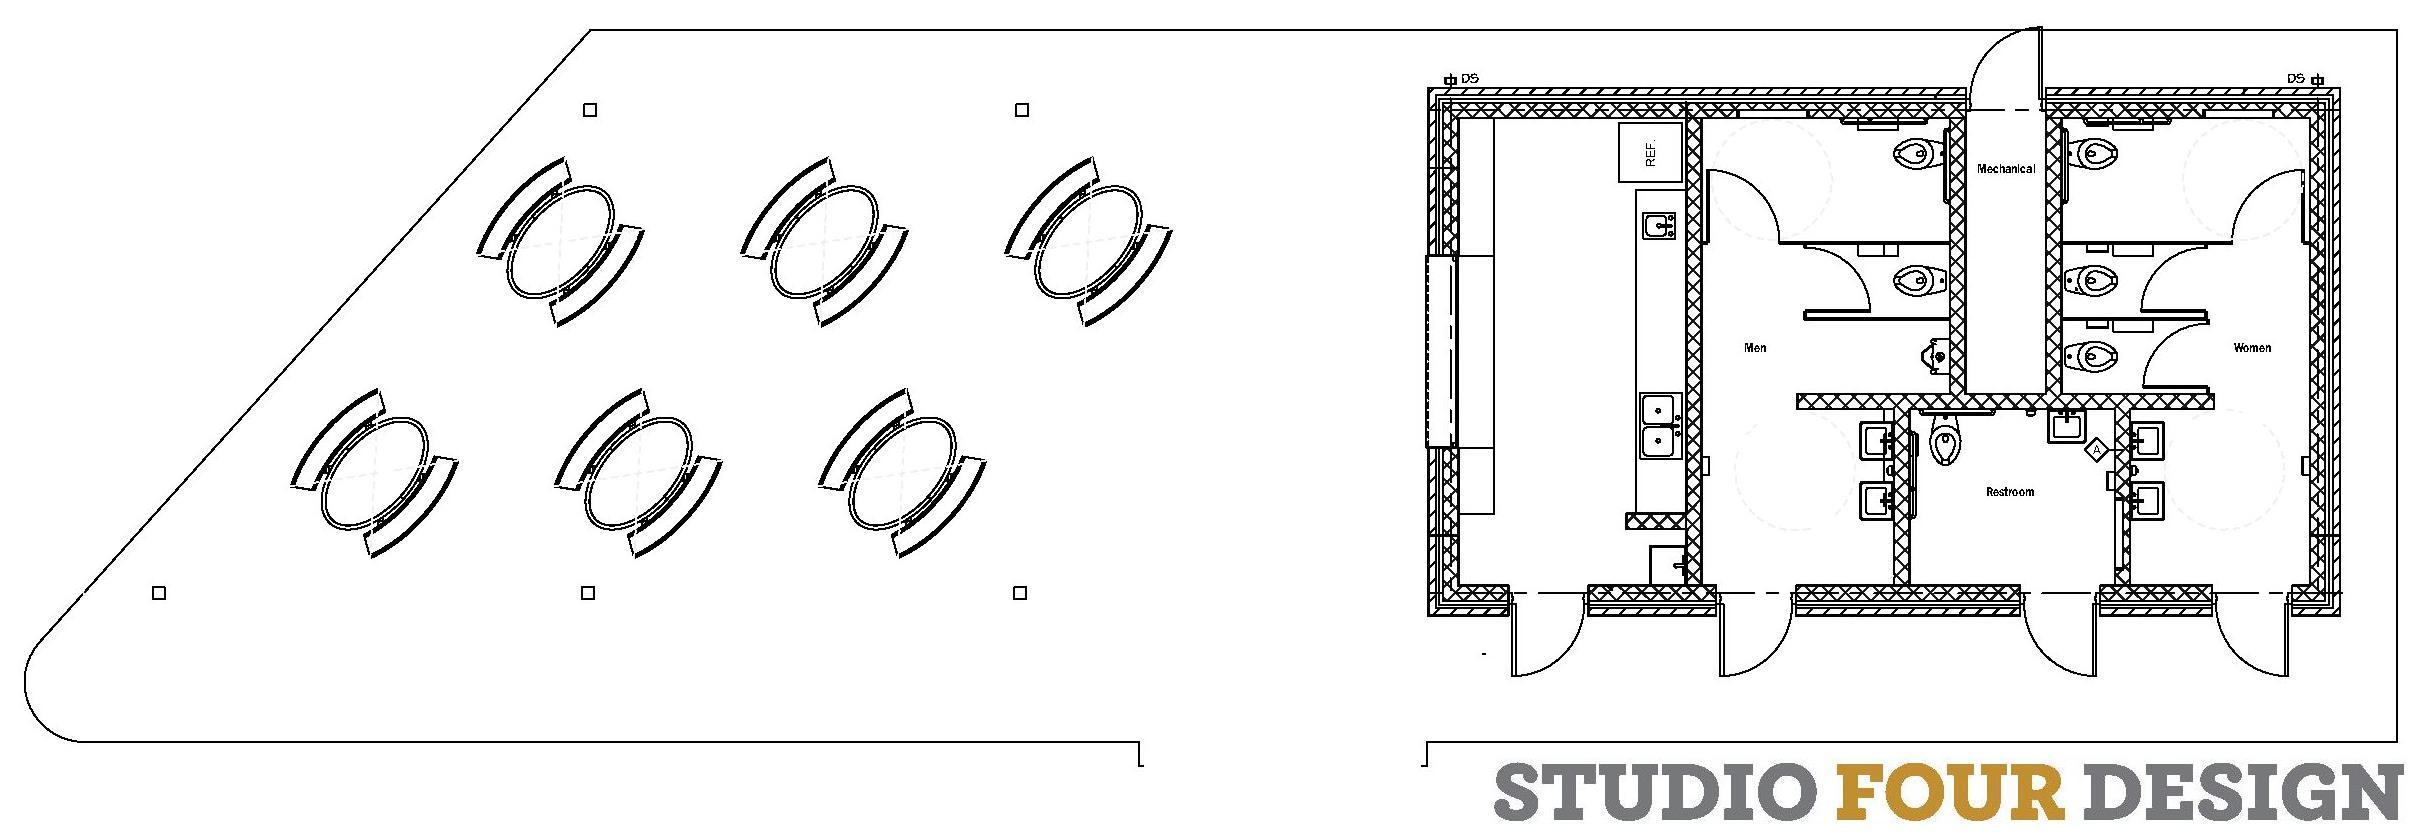 Picnic Pavilion & Restroom Building Plan